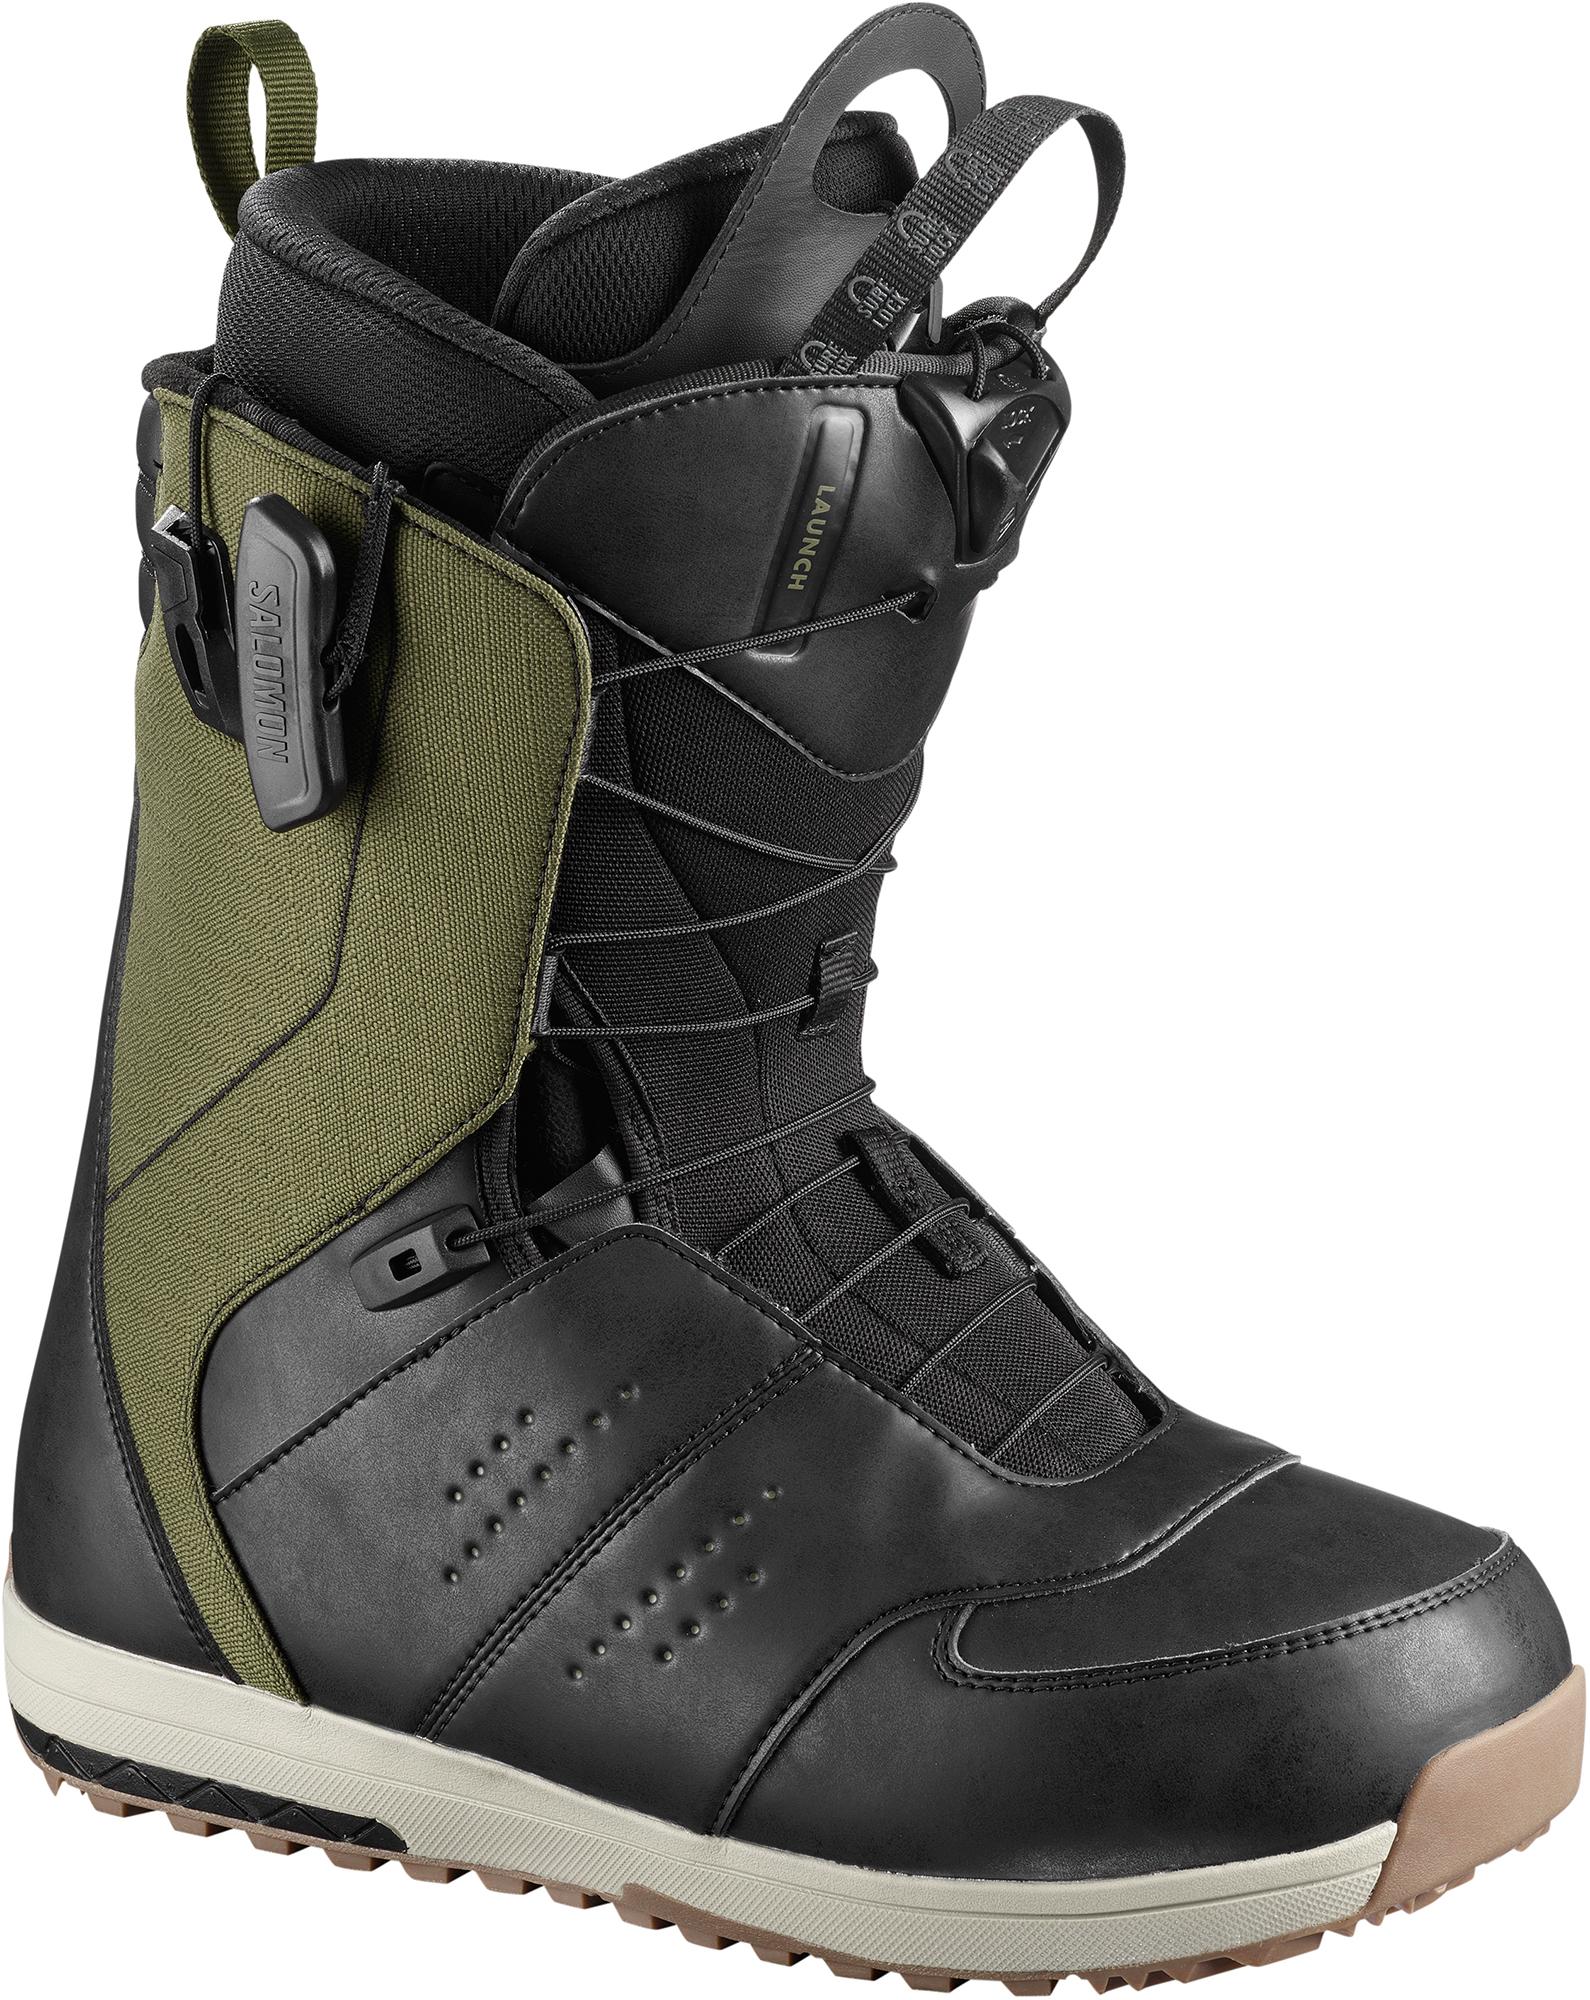 цена Salomon Сноубордические ботинки Salomon Launch, размер 44 онлайн в 2017 году